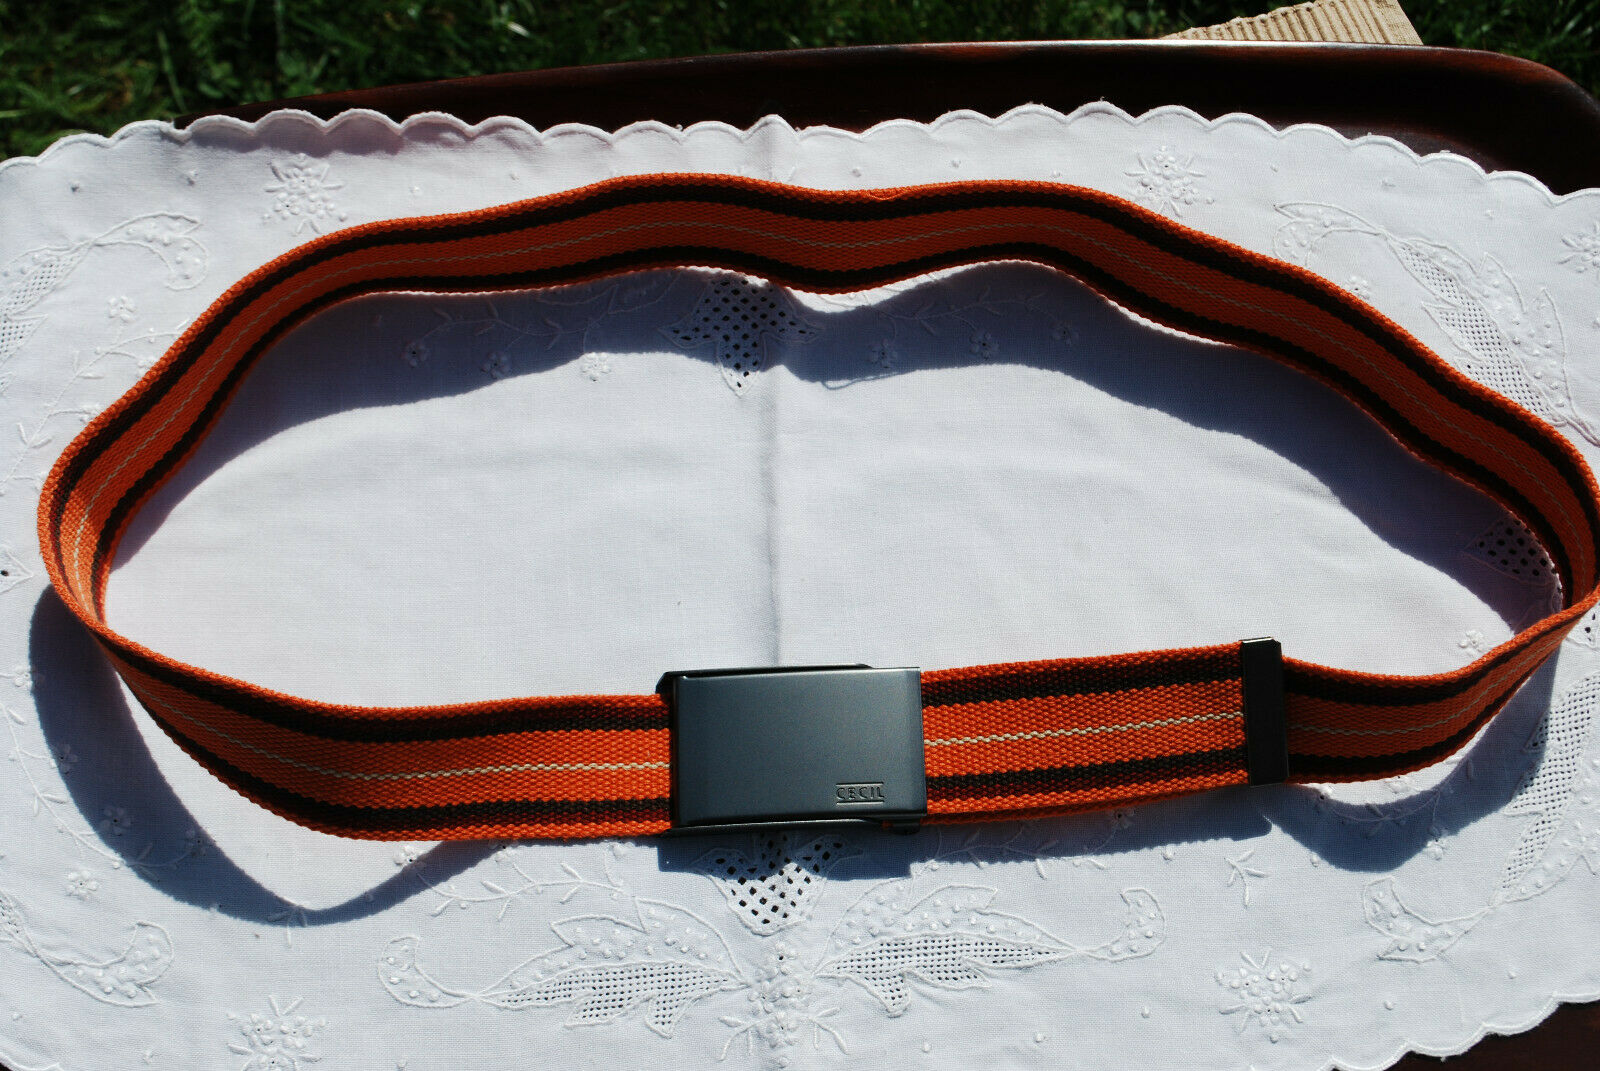 Breiter Gürtel aus gestreiftem Gurtband